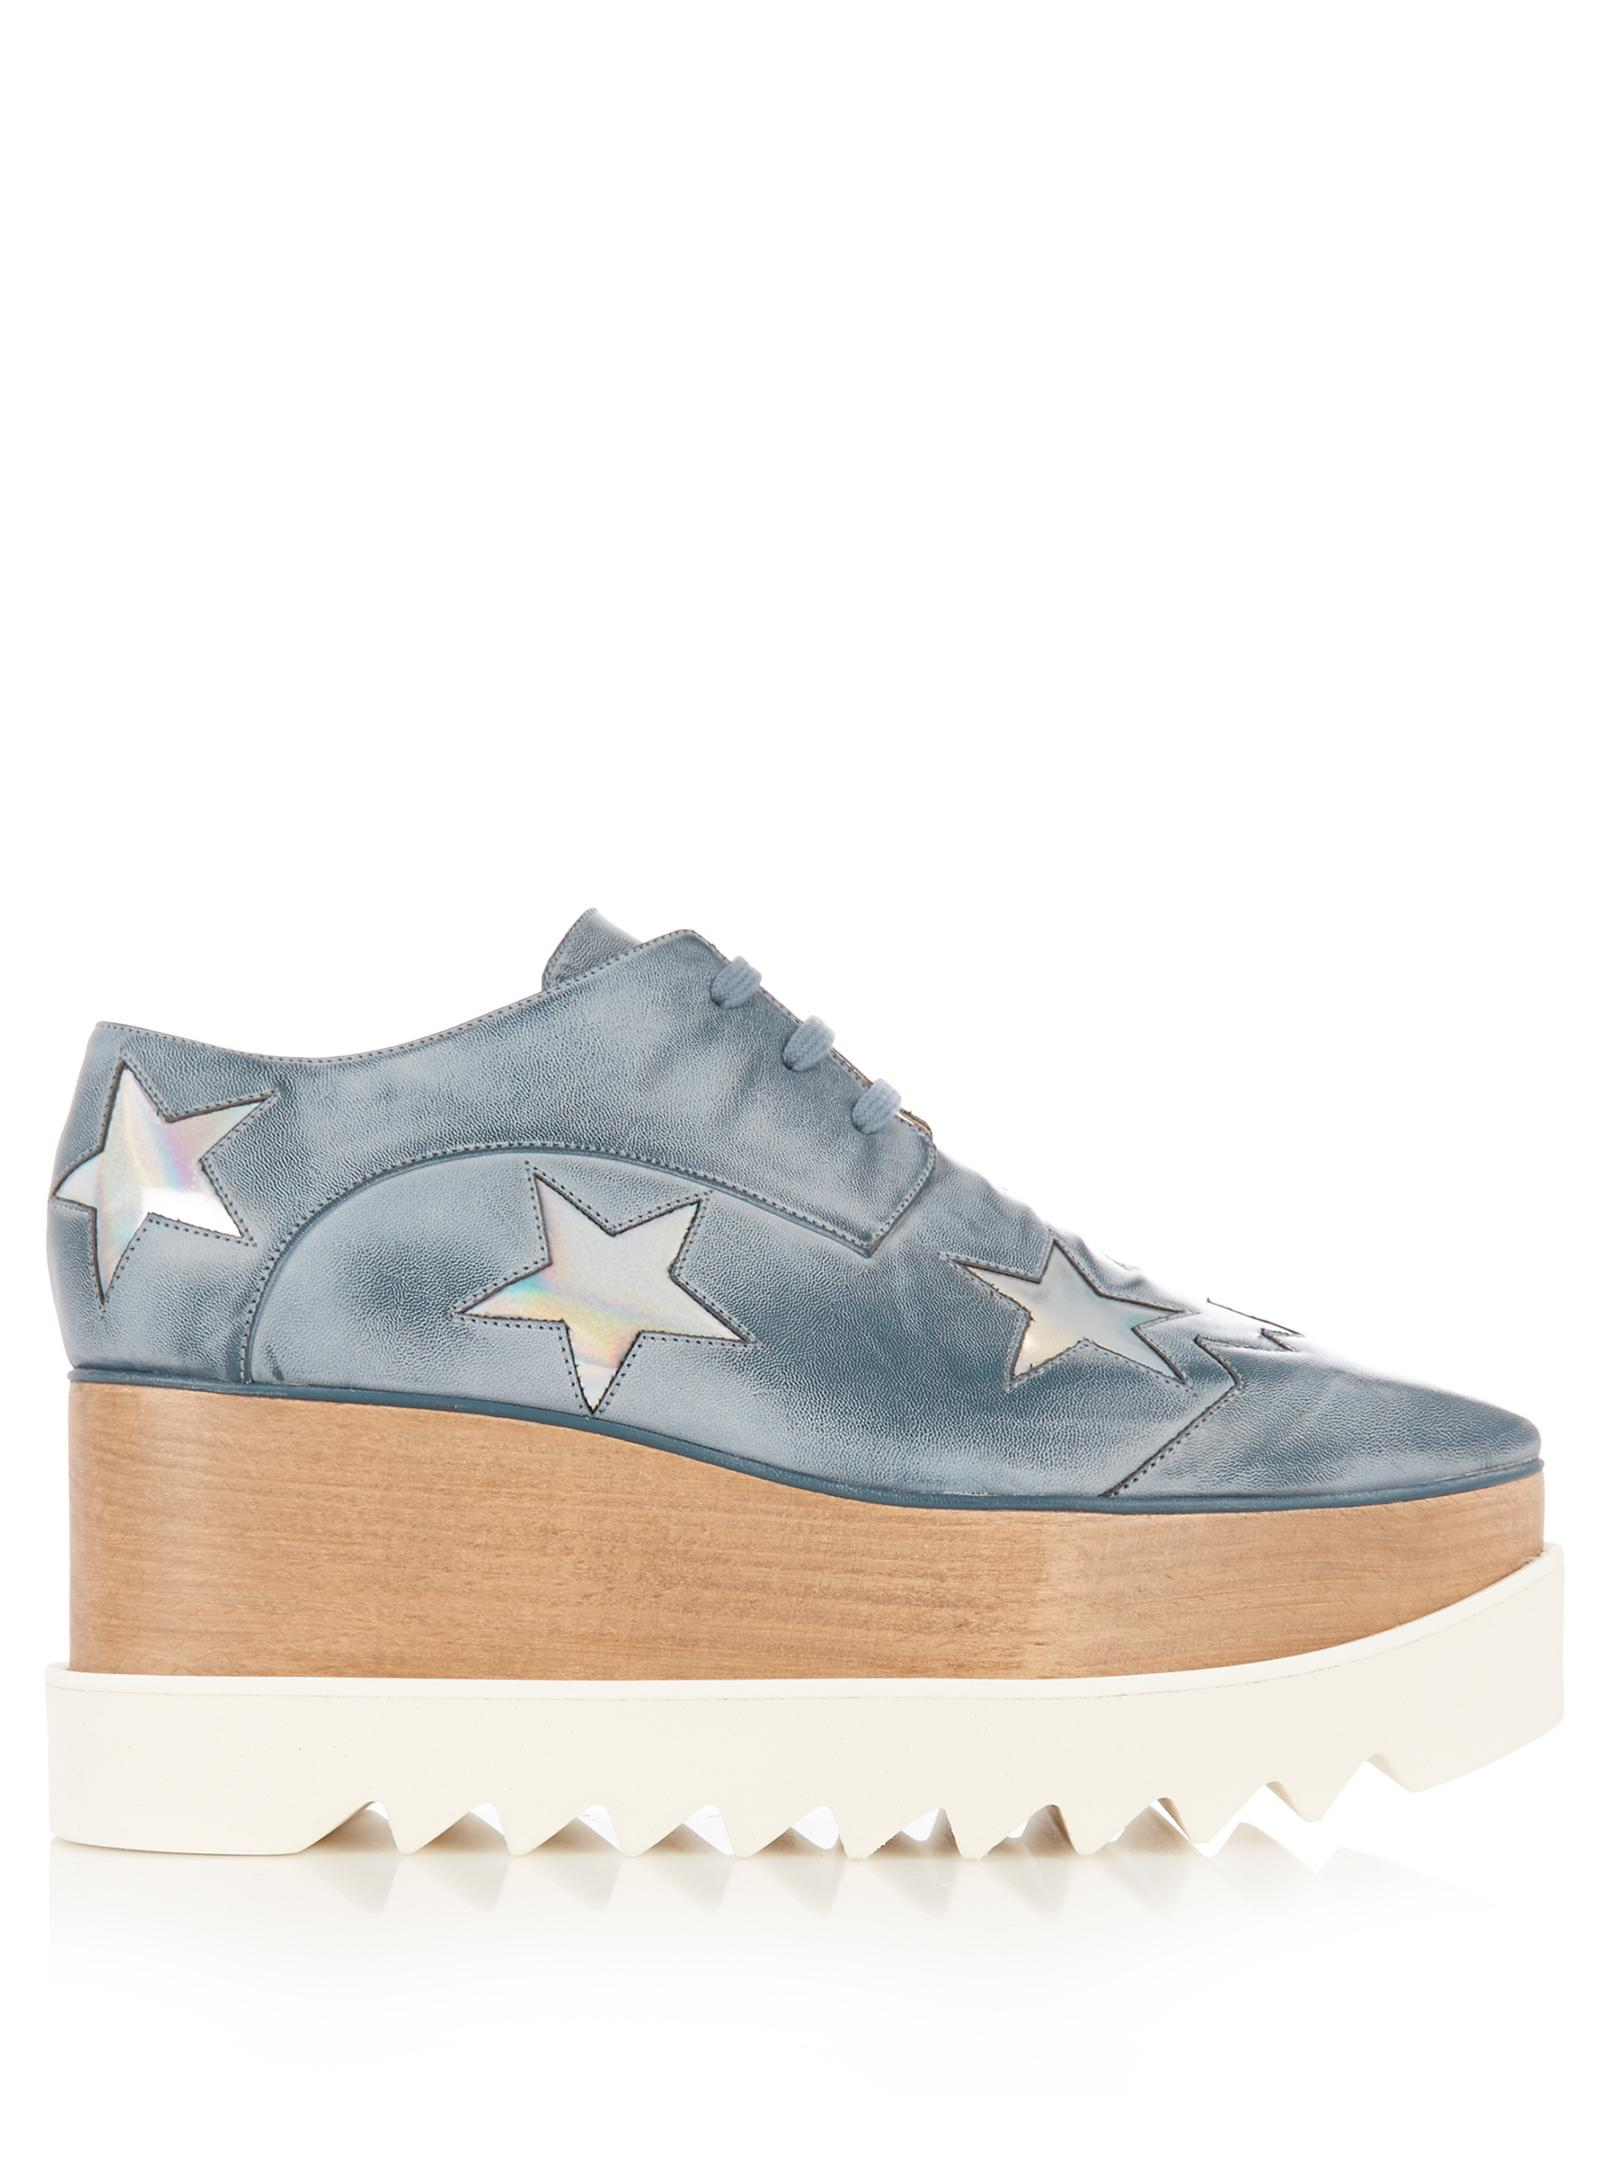 cf746c27347a Lyst - Stella McCartney Elyse Lace-up Platform Shoes in Blue